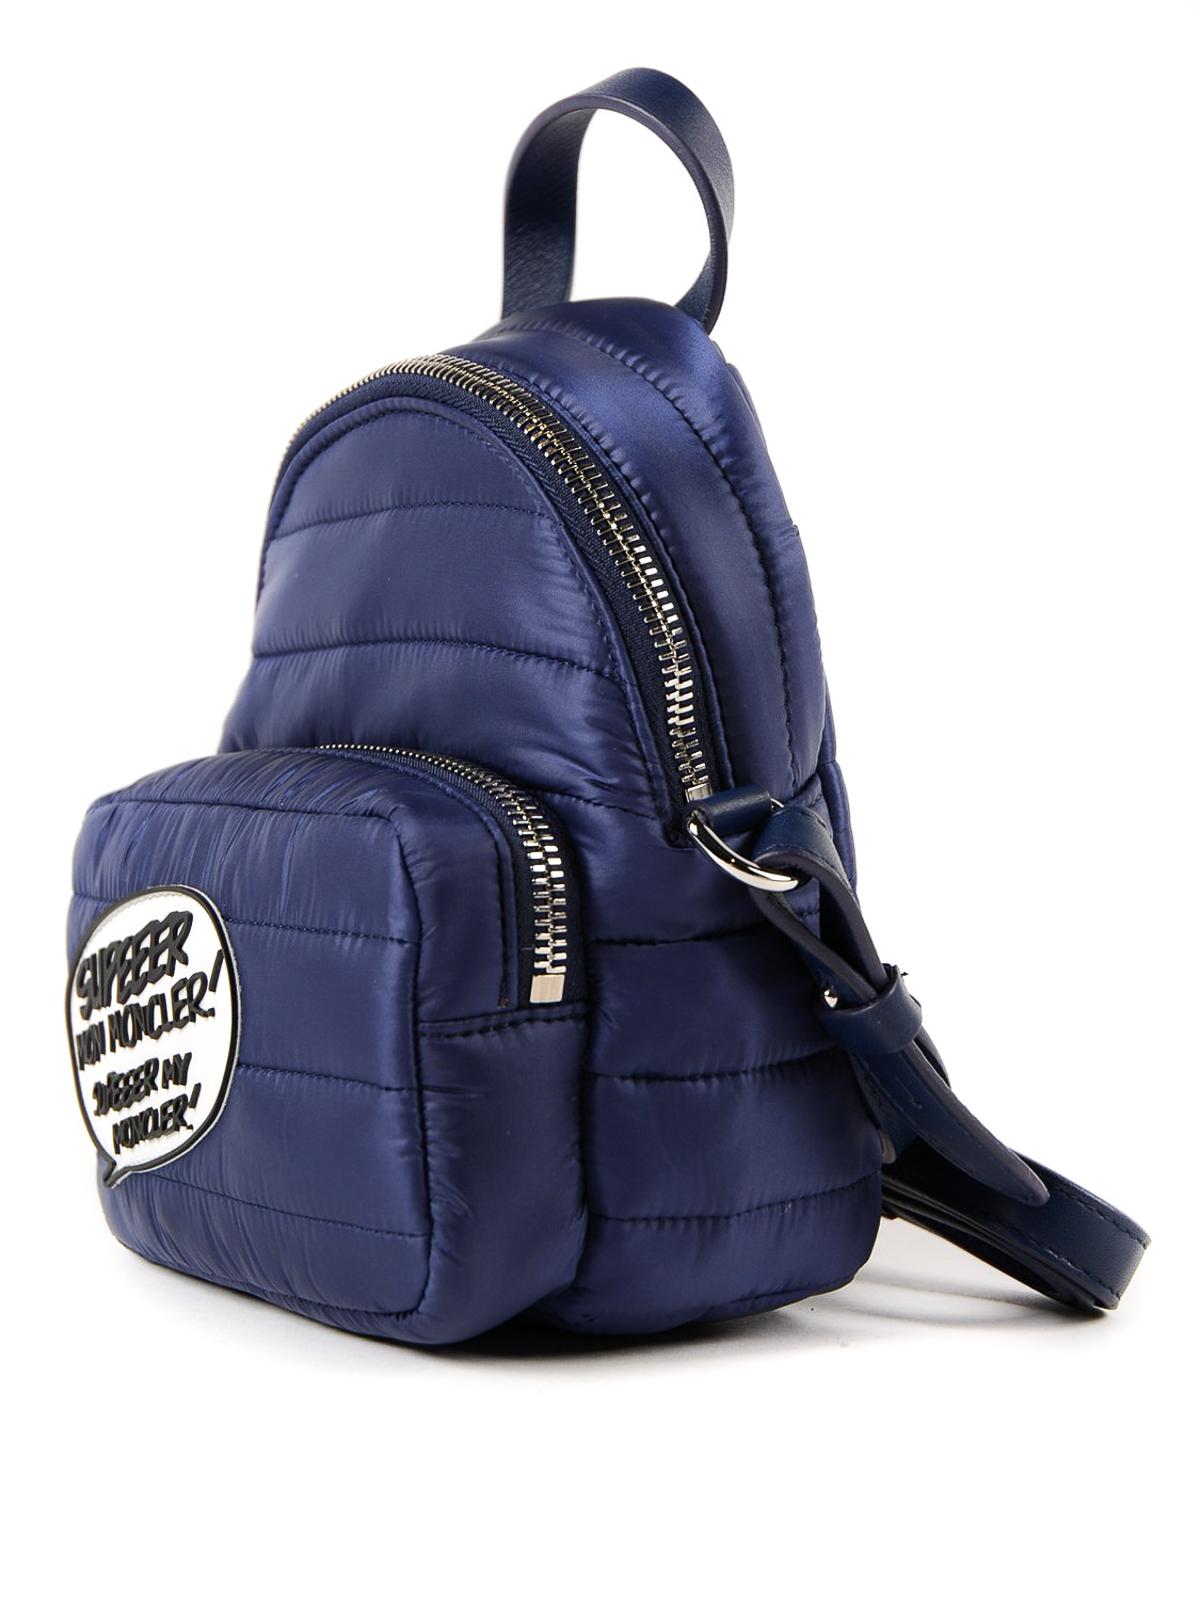 moncler in borsa oggi